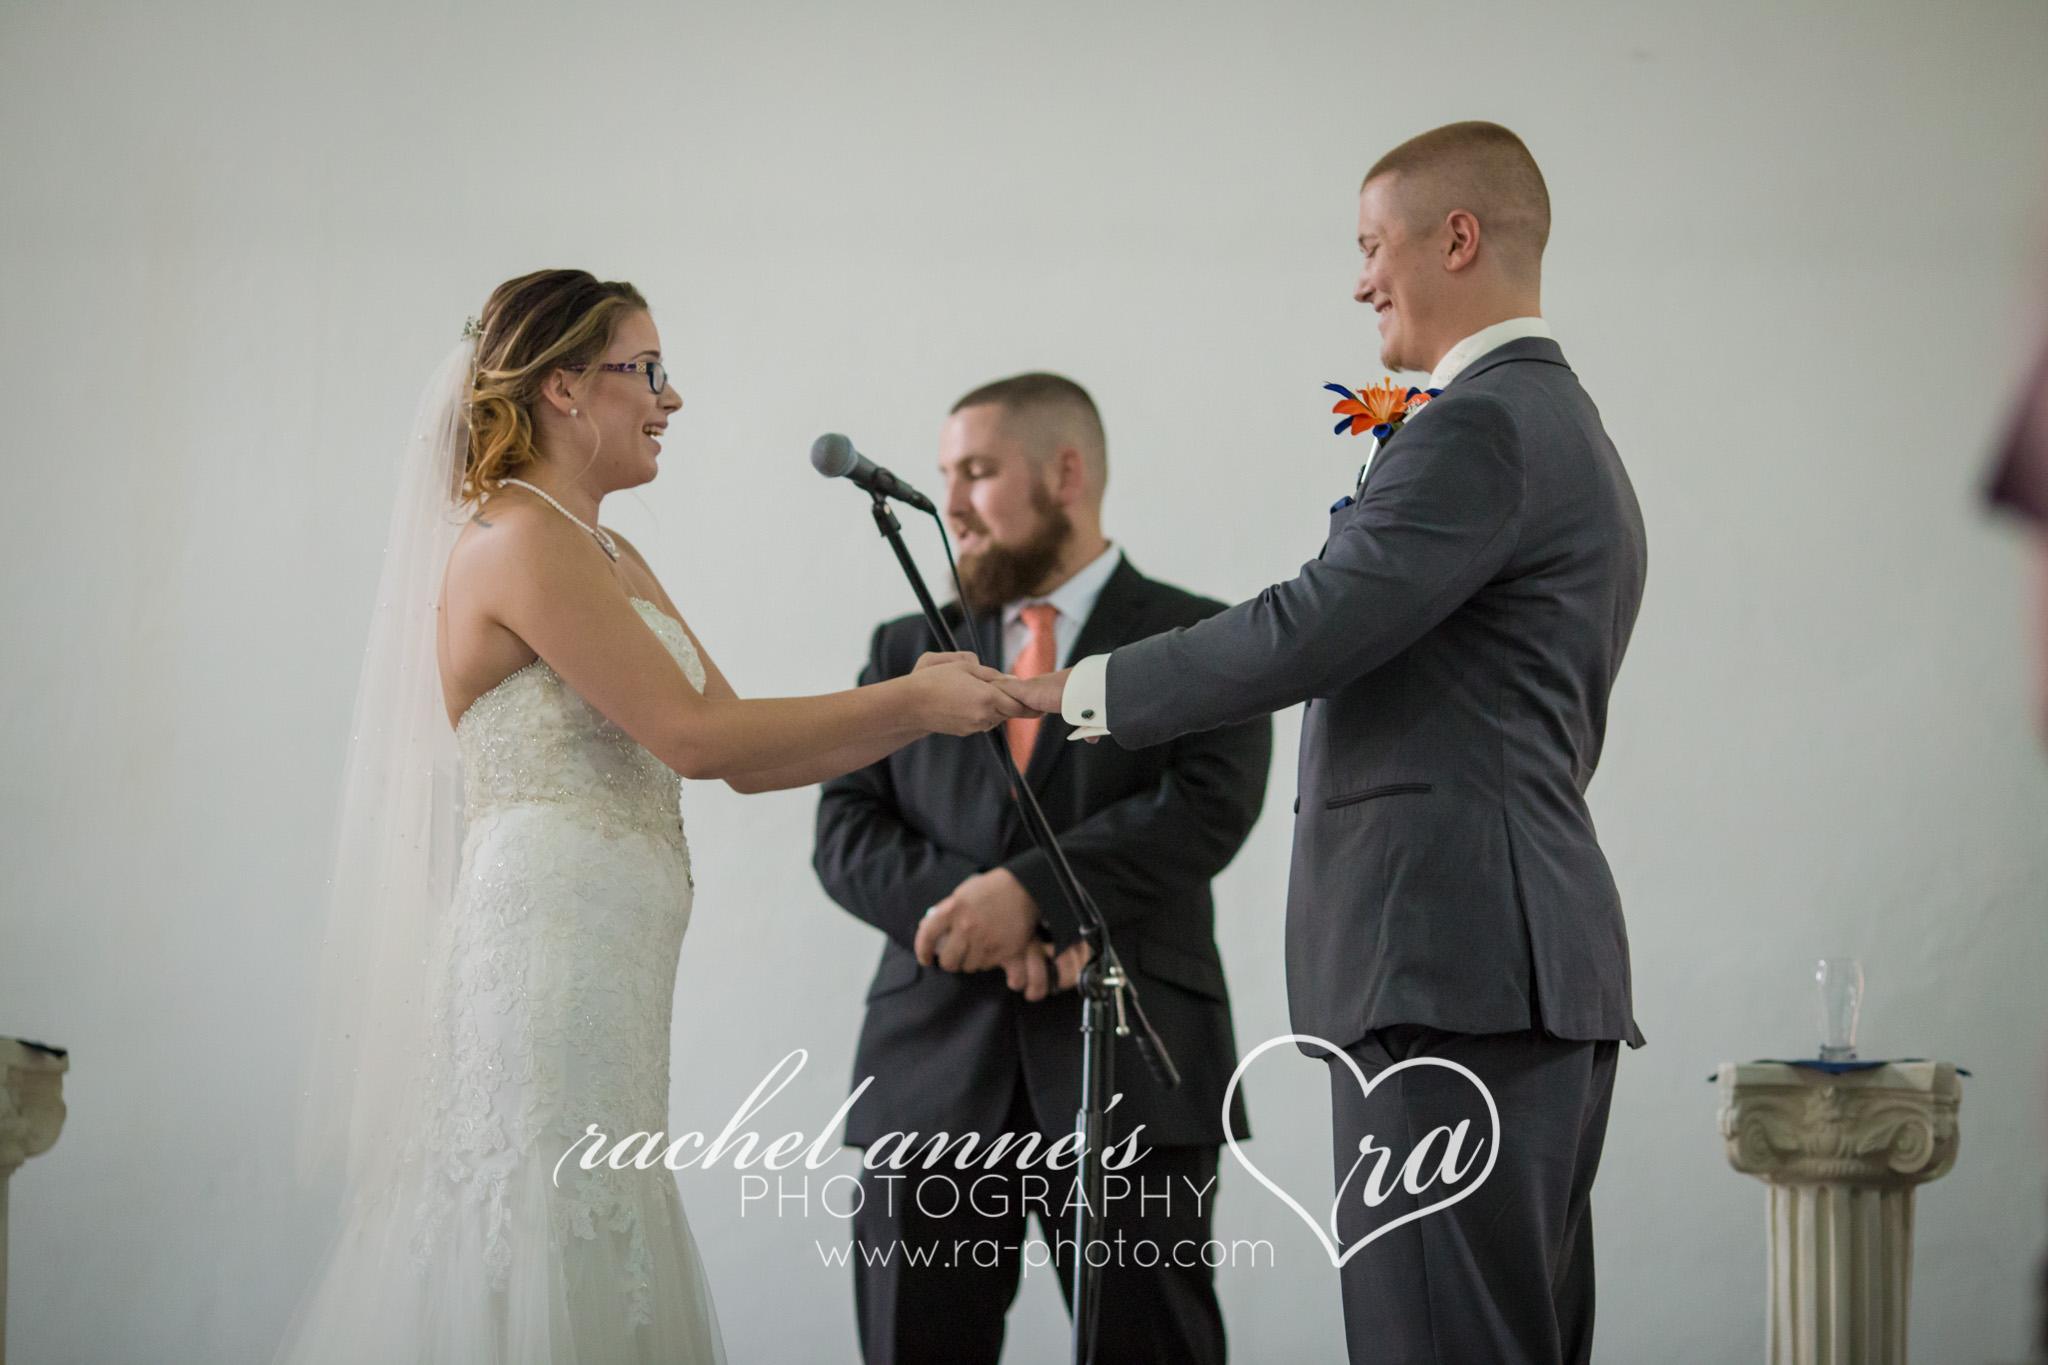 040-JCM-OLD-ECONOMY-VILLAGE-THE-FEZ-PA-WEDDINGS.jpg